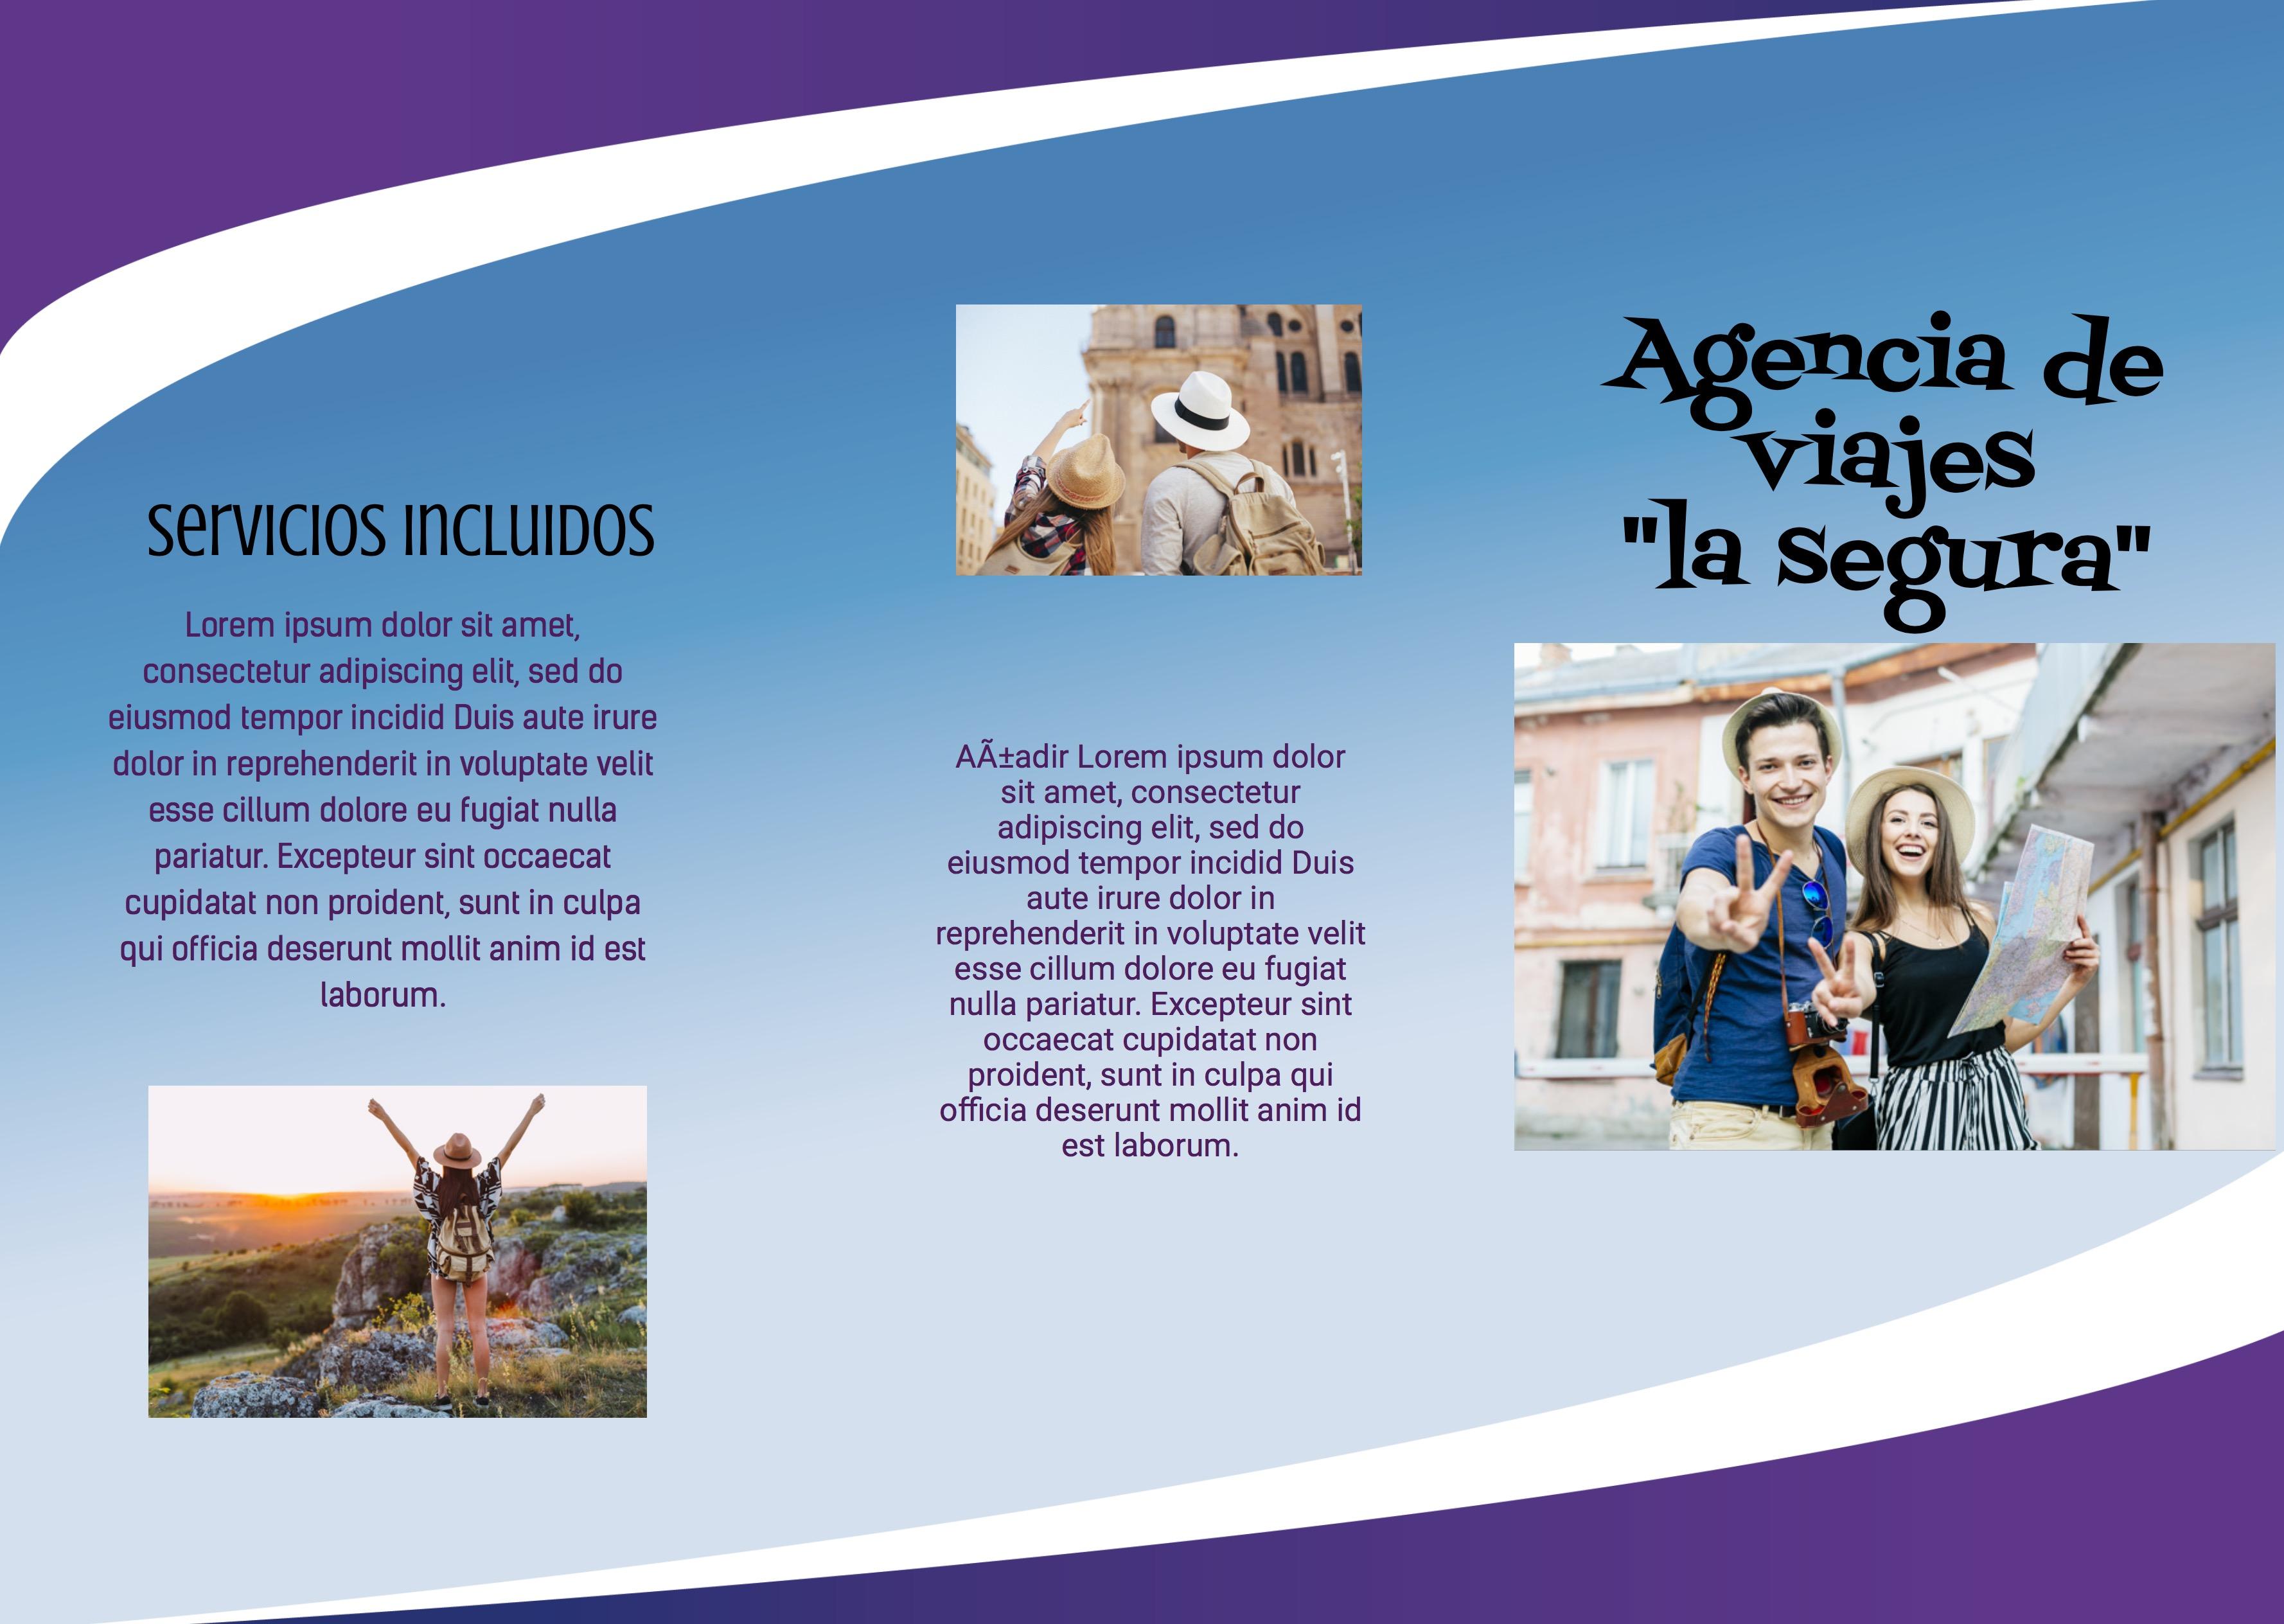 Trípticos agencia de viajes